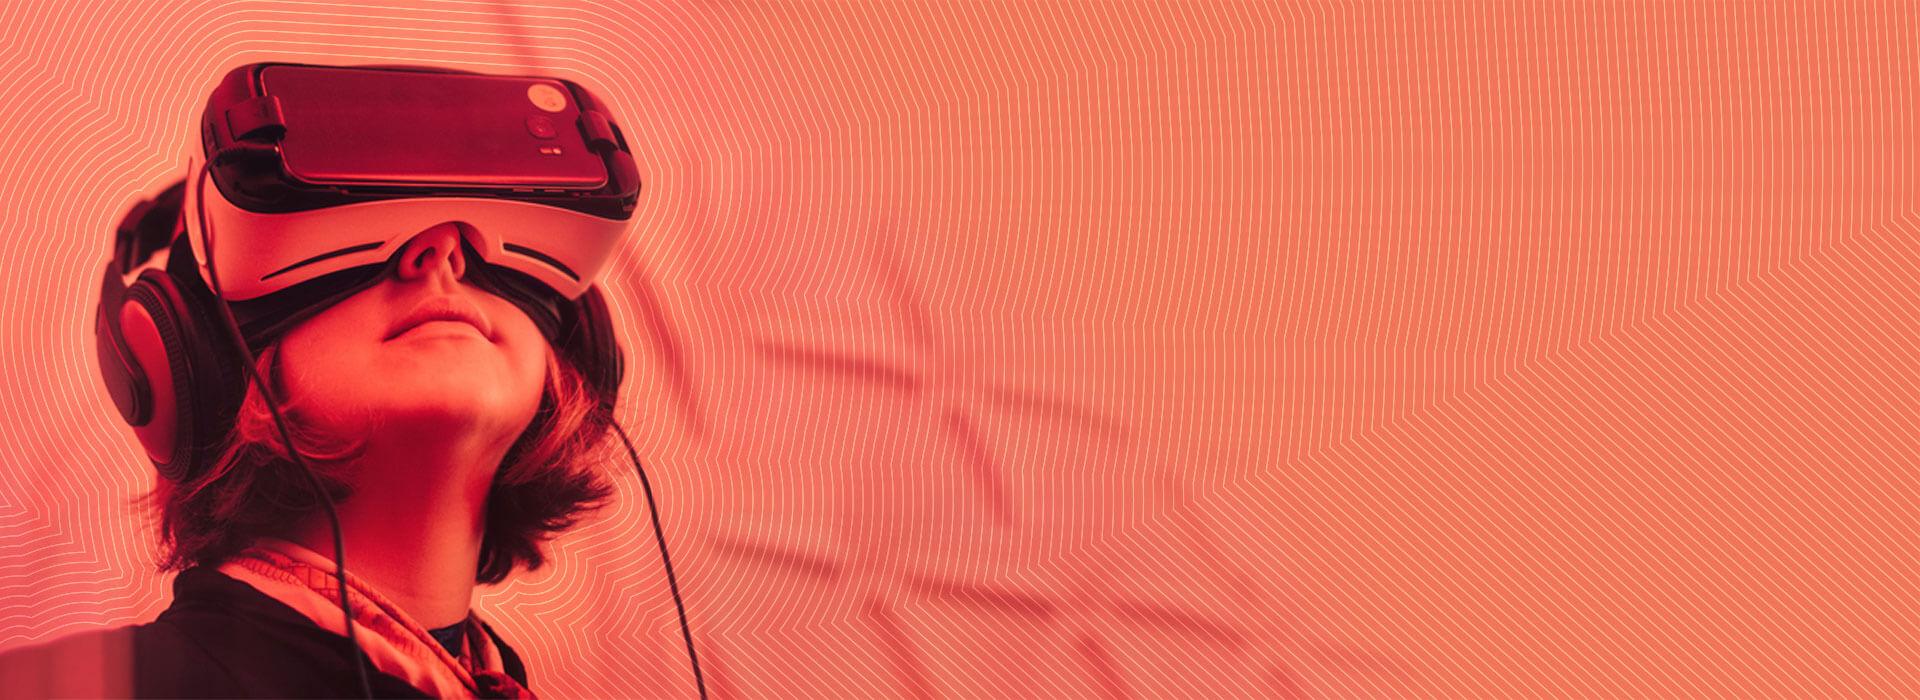 inmersys-rv-orange.jpg